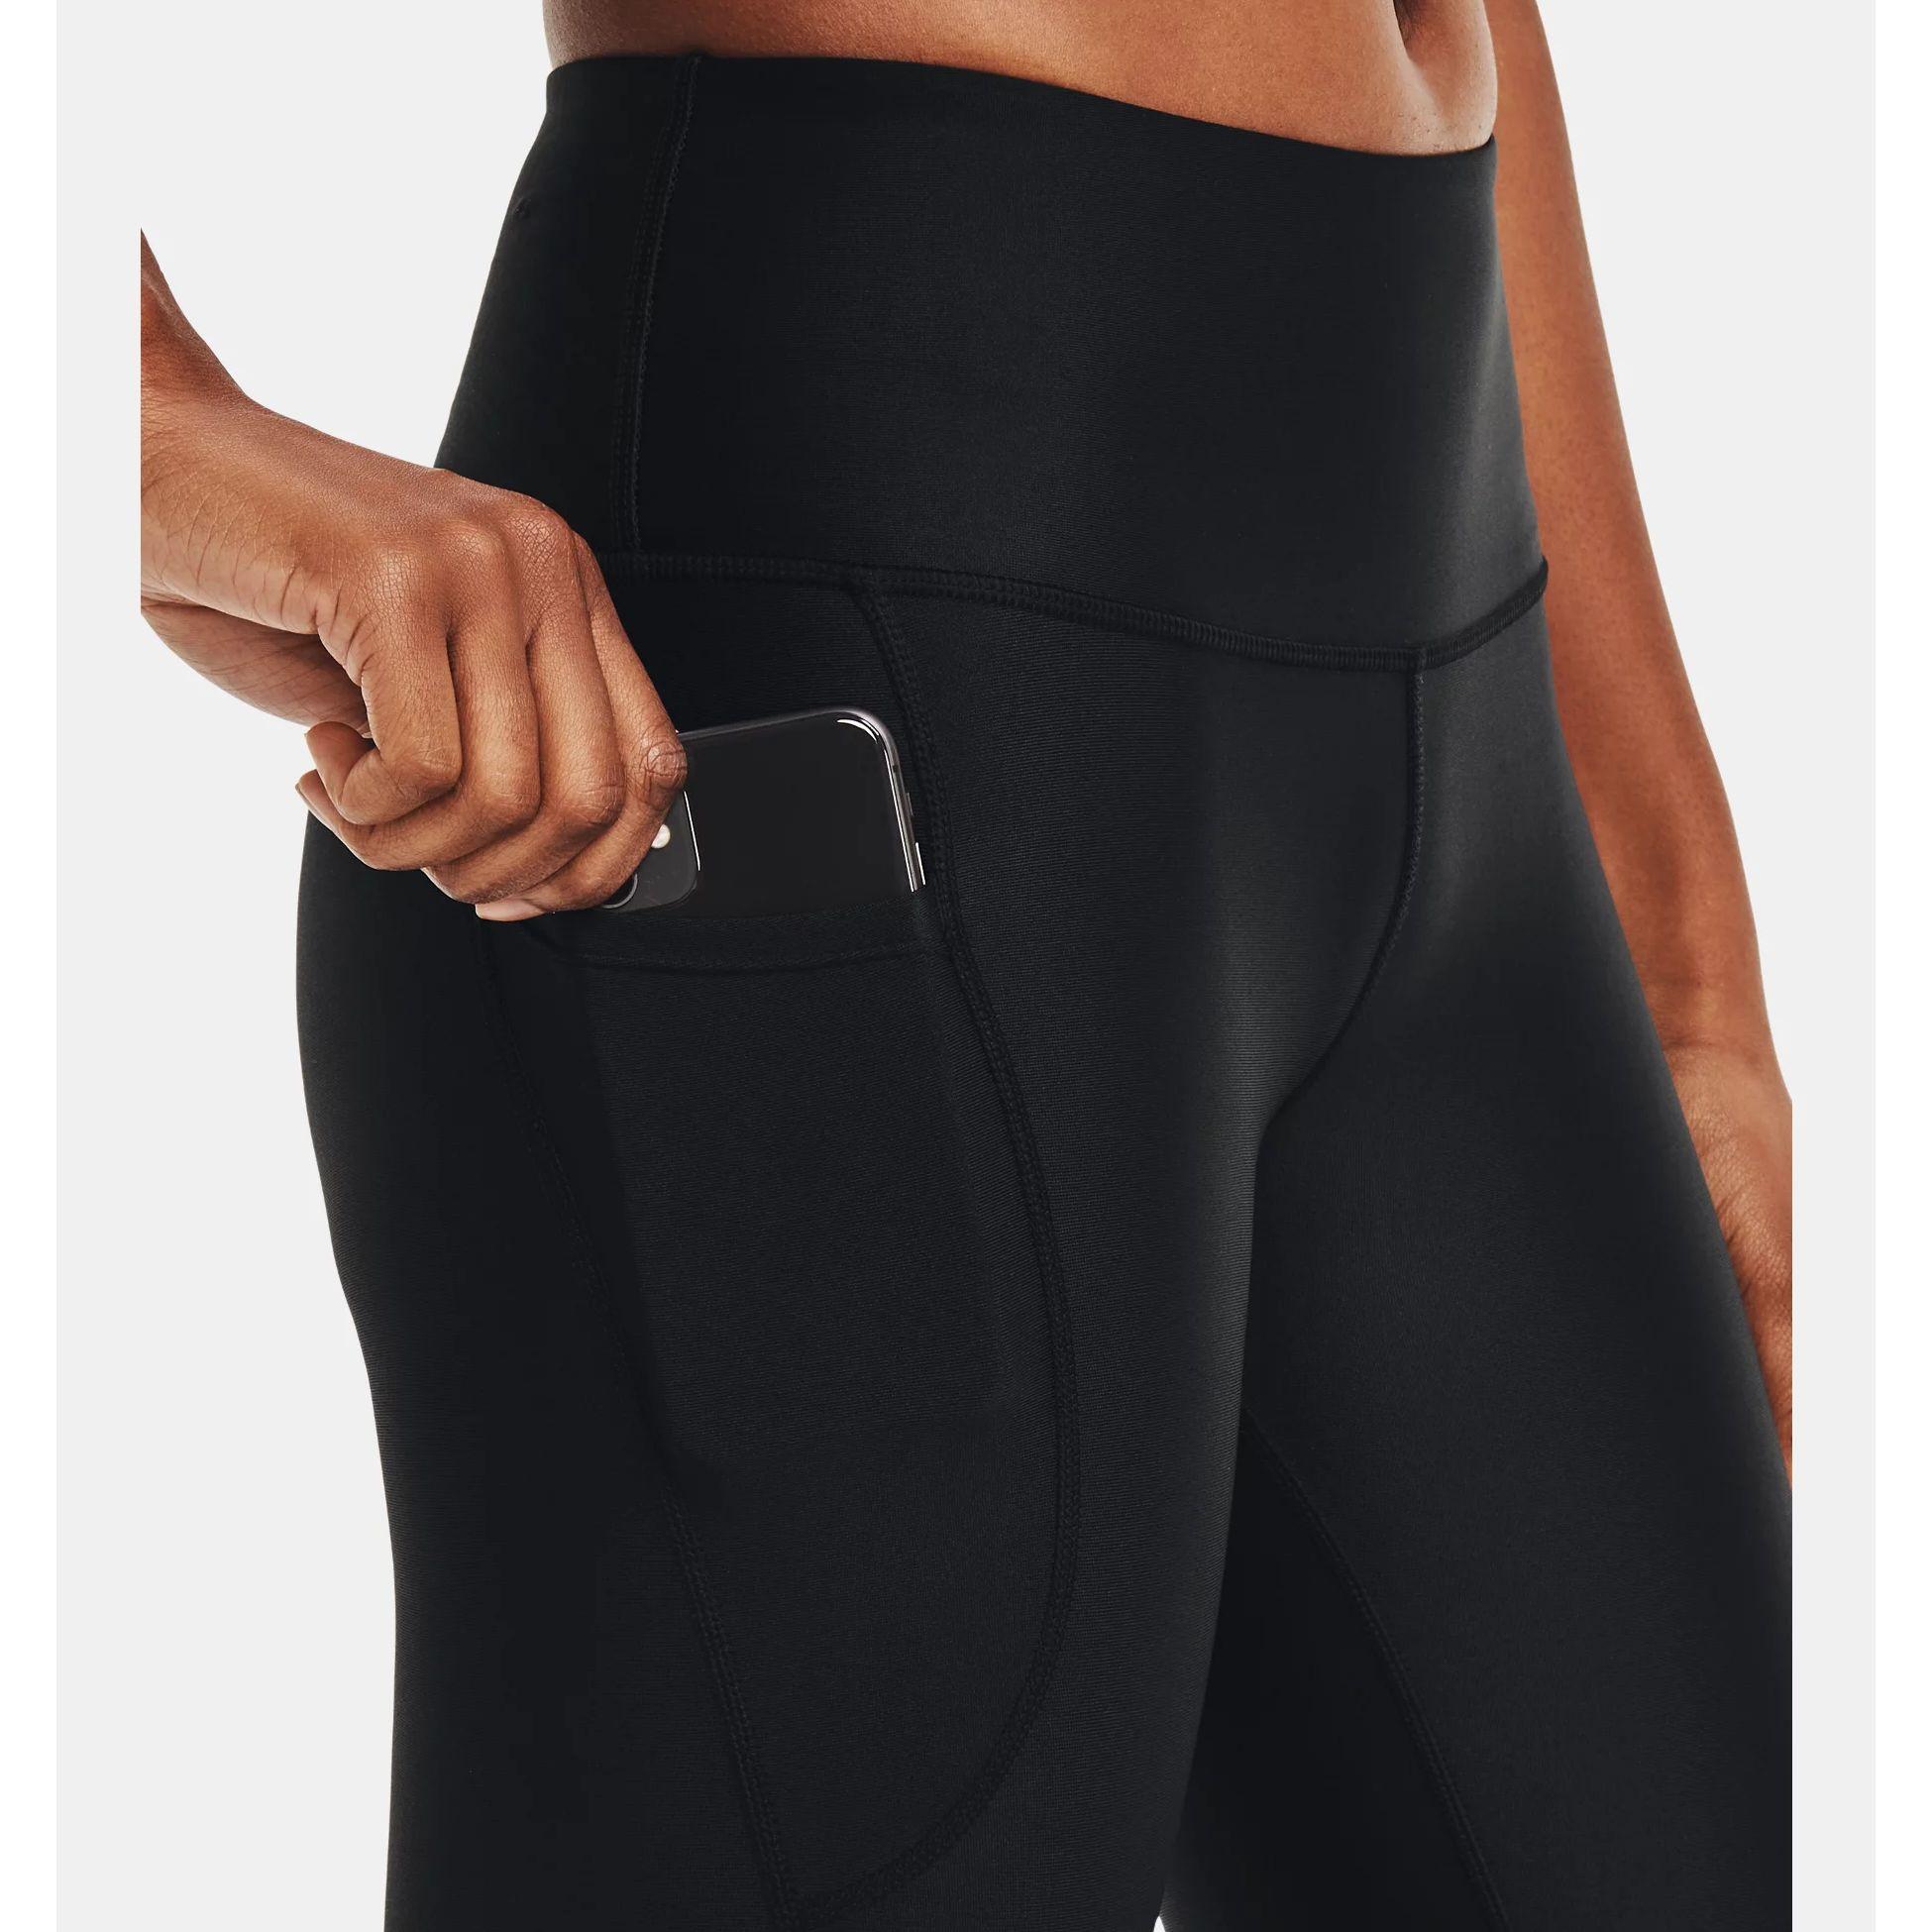 Clothing -  under armour HeatGear Armour No-Slip Waistband Shine Full-Length Leggings